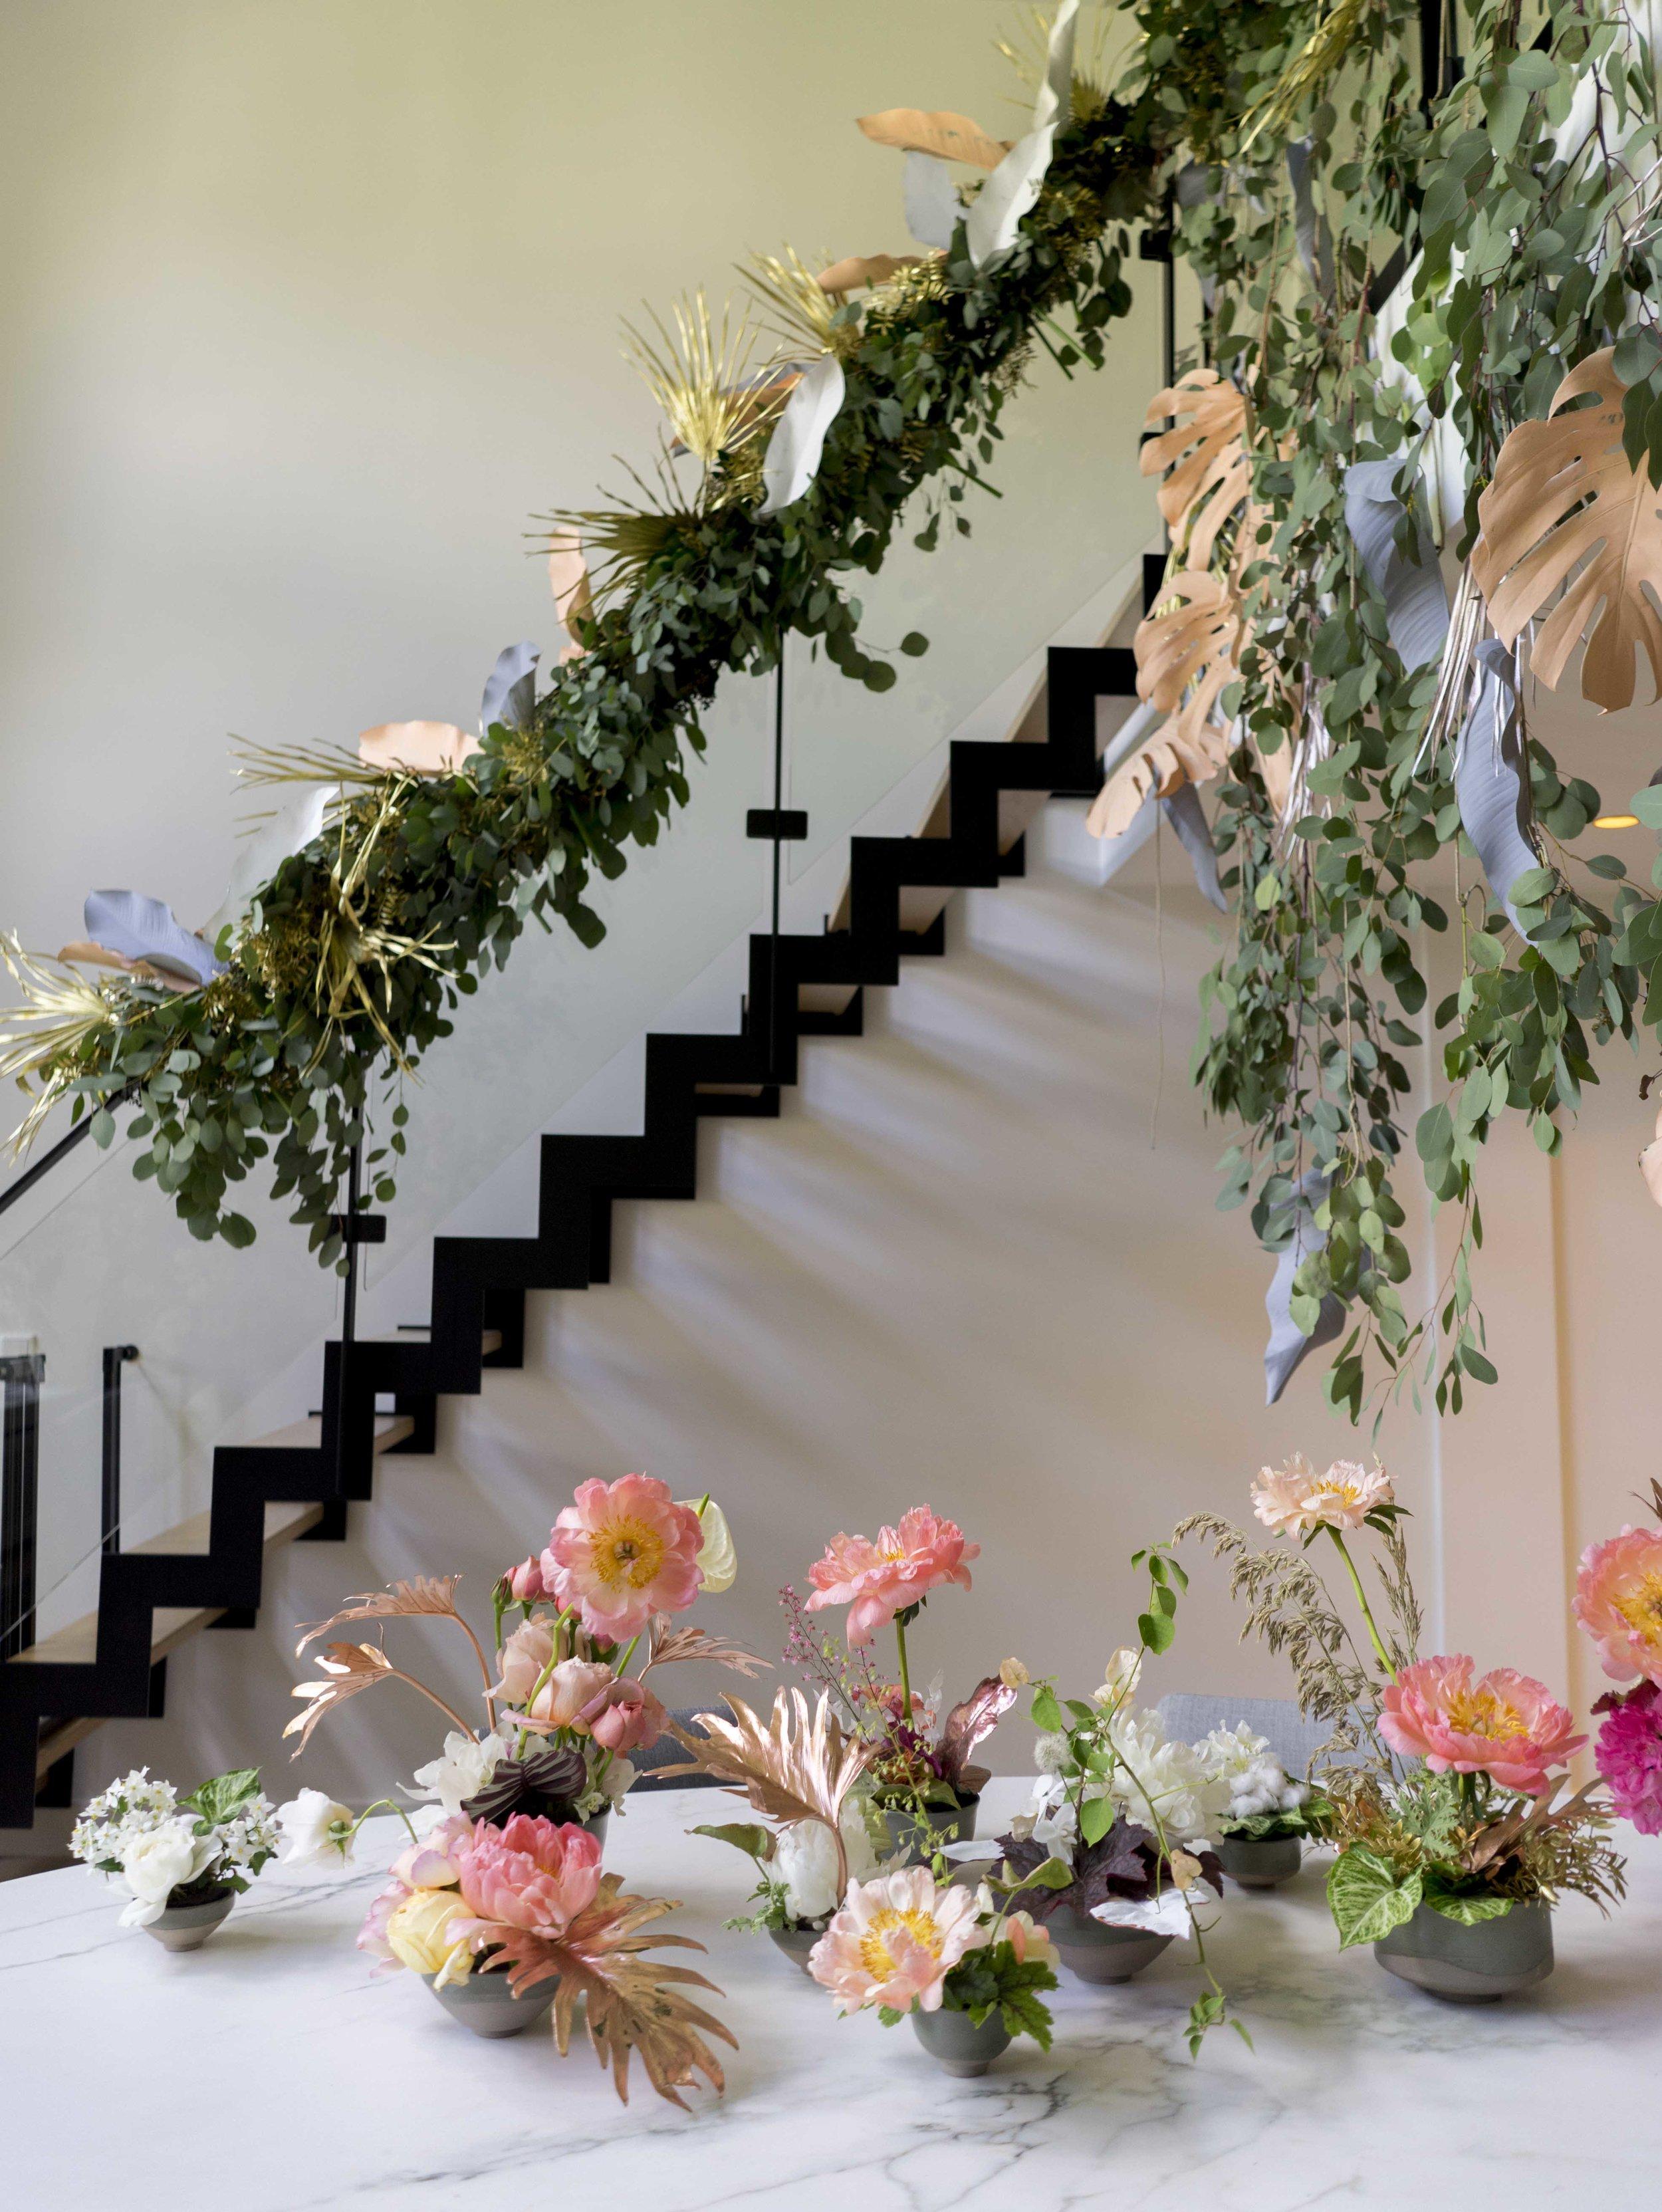 #apbloem #florist #bloemist #amsterdam #bloemen #kerkstraat #trouwen #event #love #liefde #bloemen #flowers #wedding #bruiloft #dscolor #dsfloral #weddingstyling #peony #styling